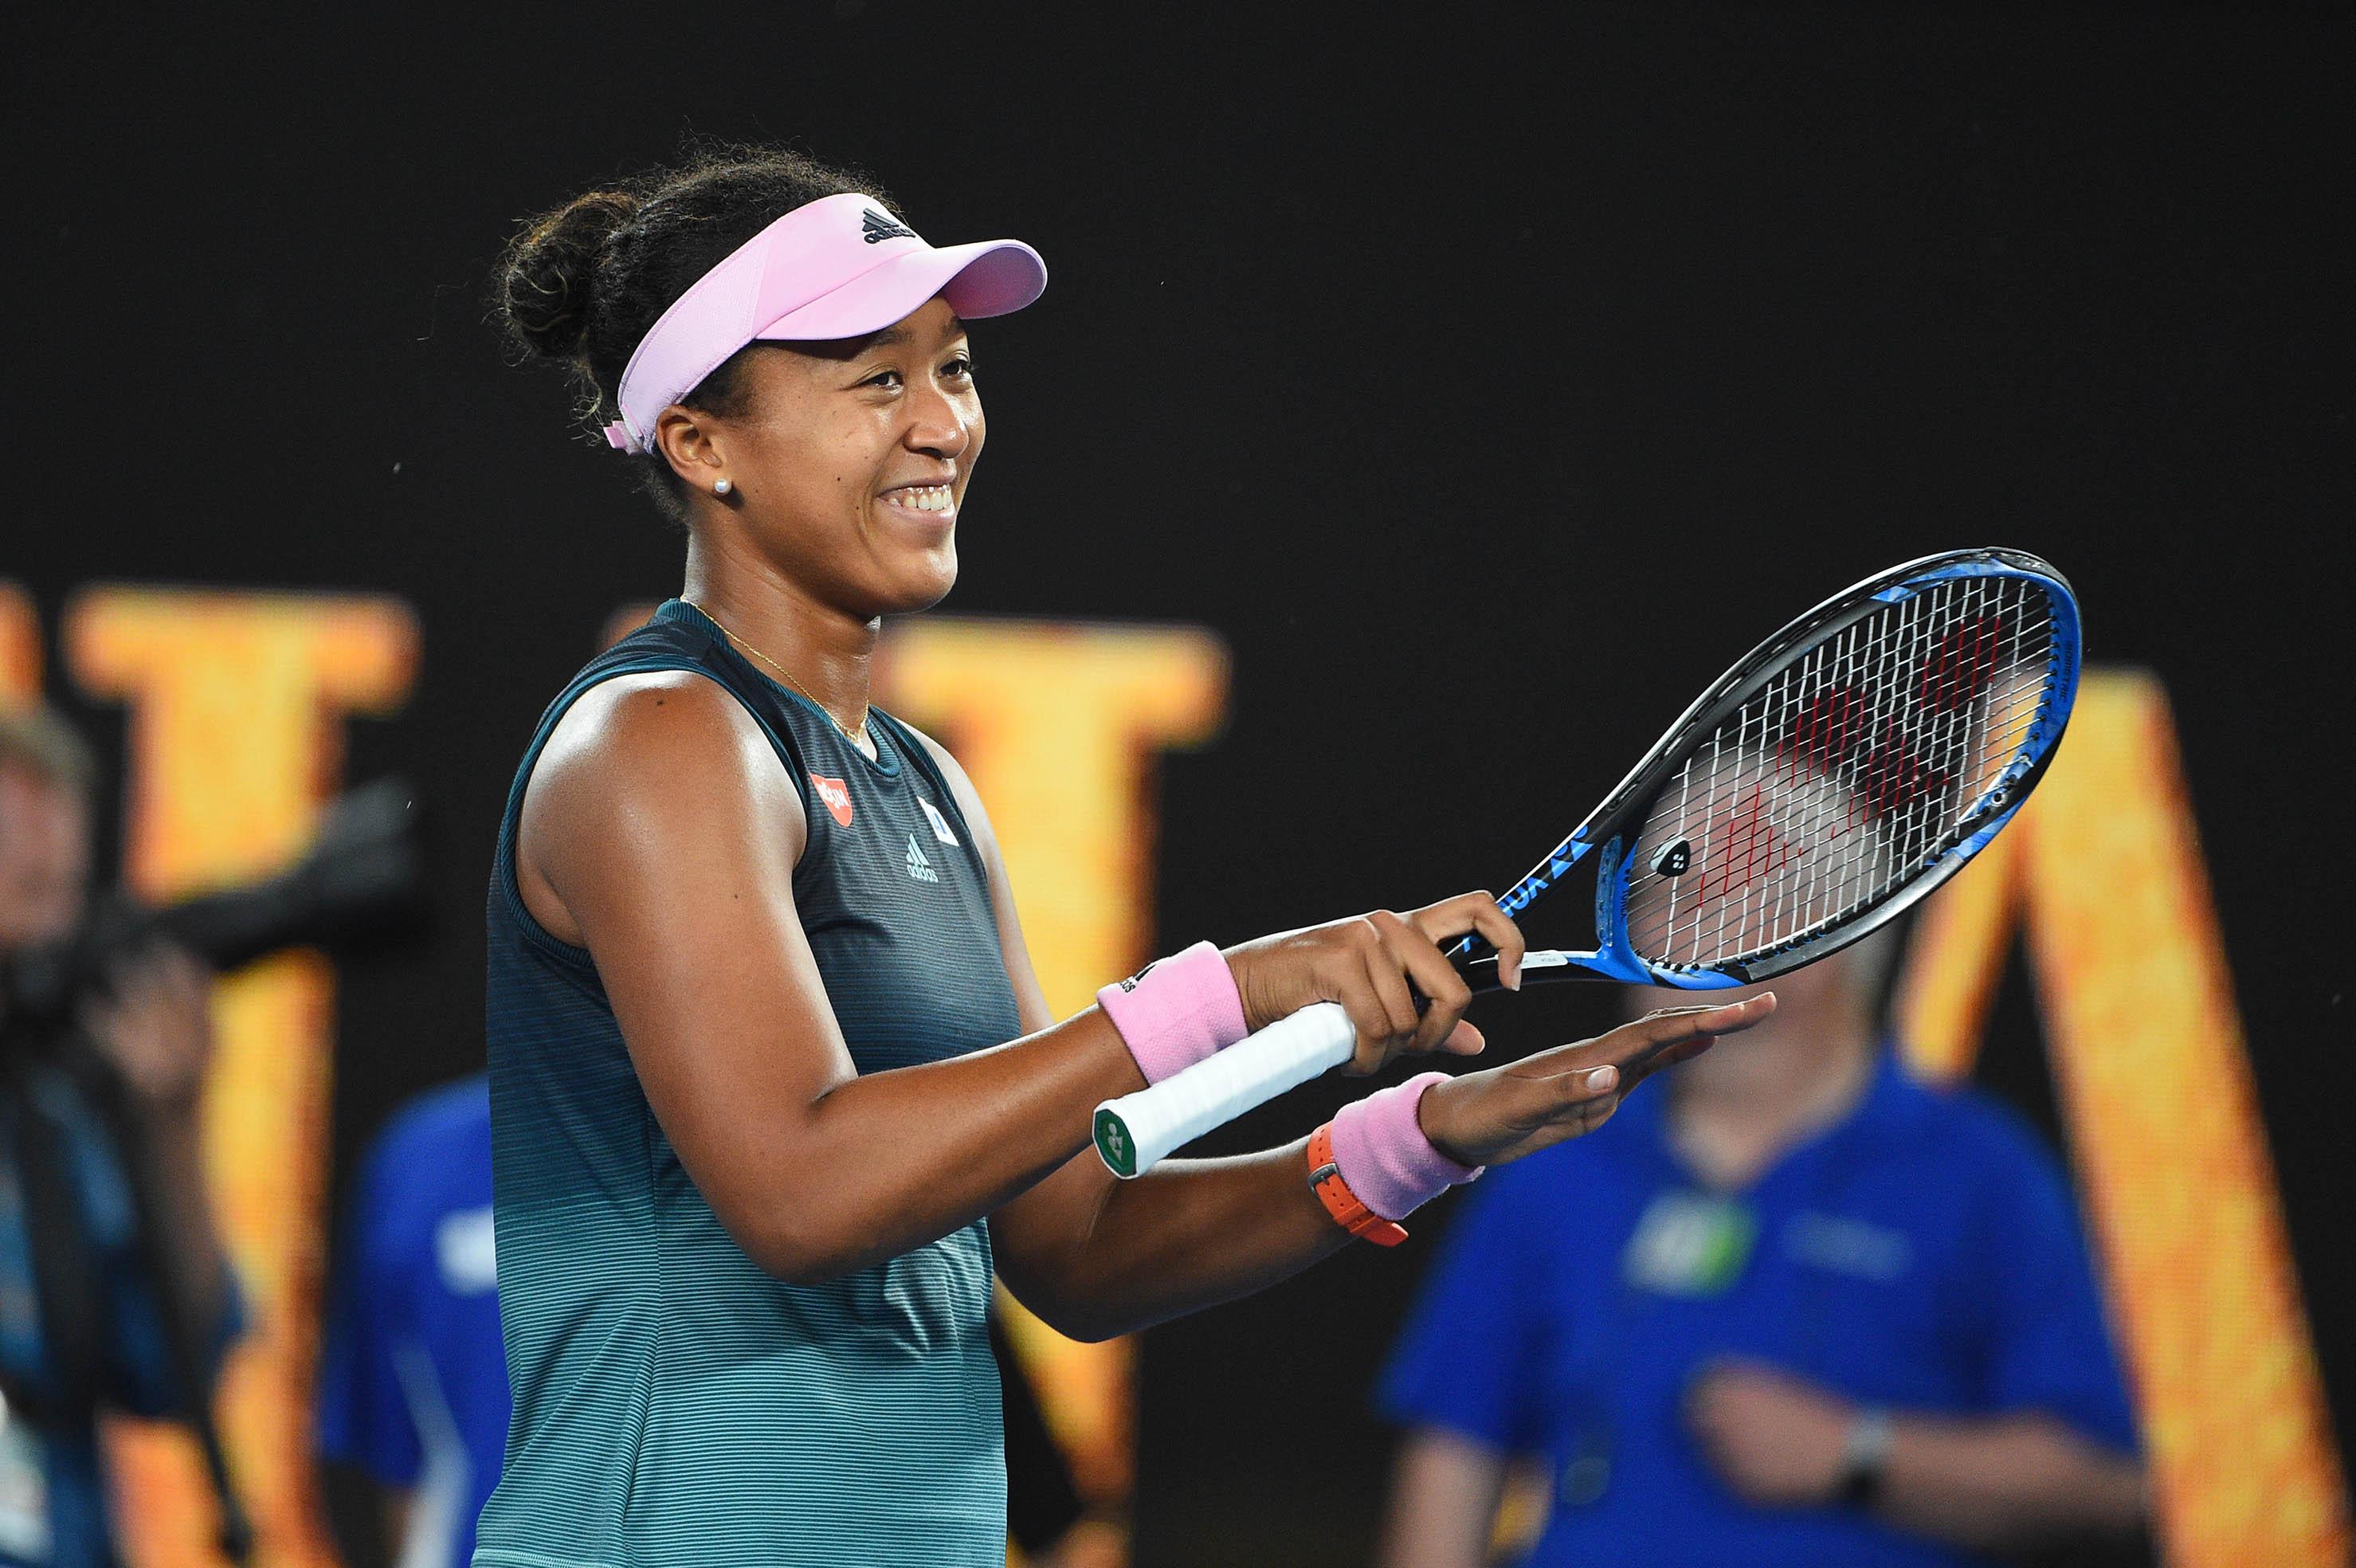 The moment when Naomi Osaka realises she has just won the 2019 Australian Open